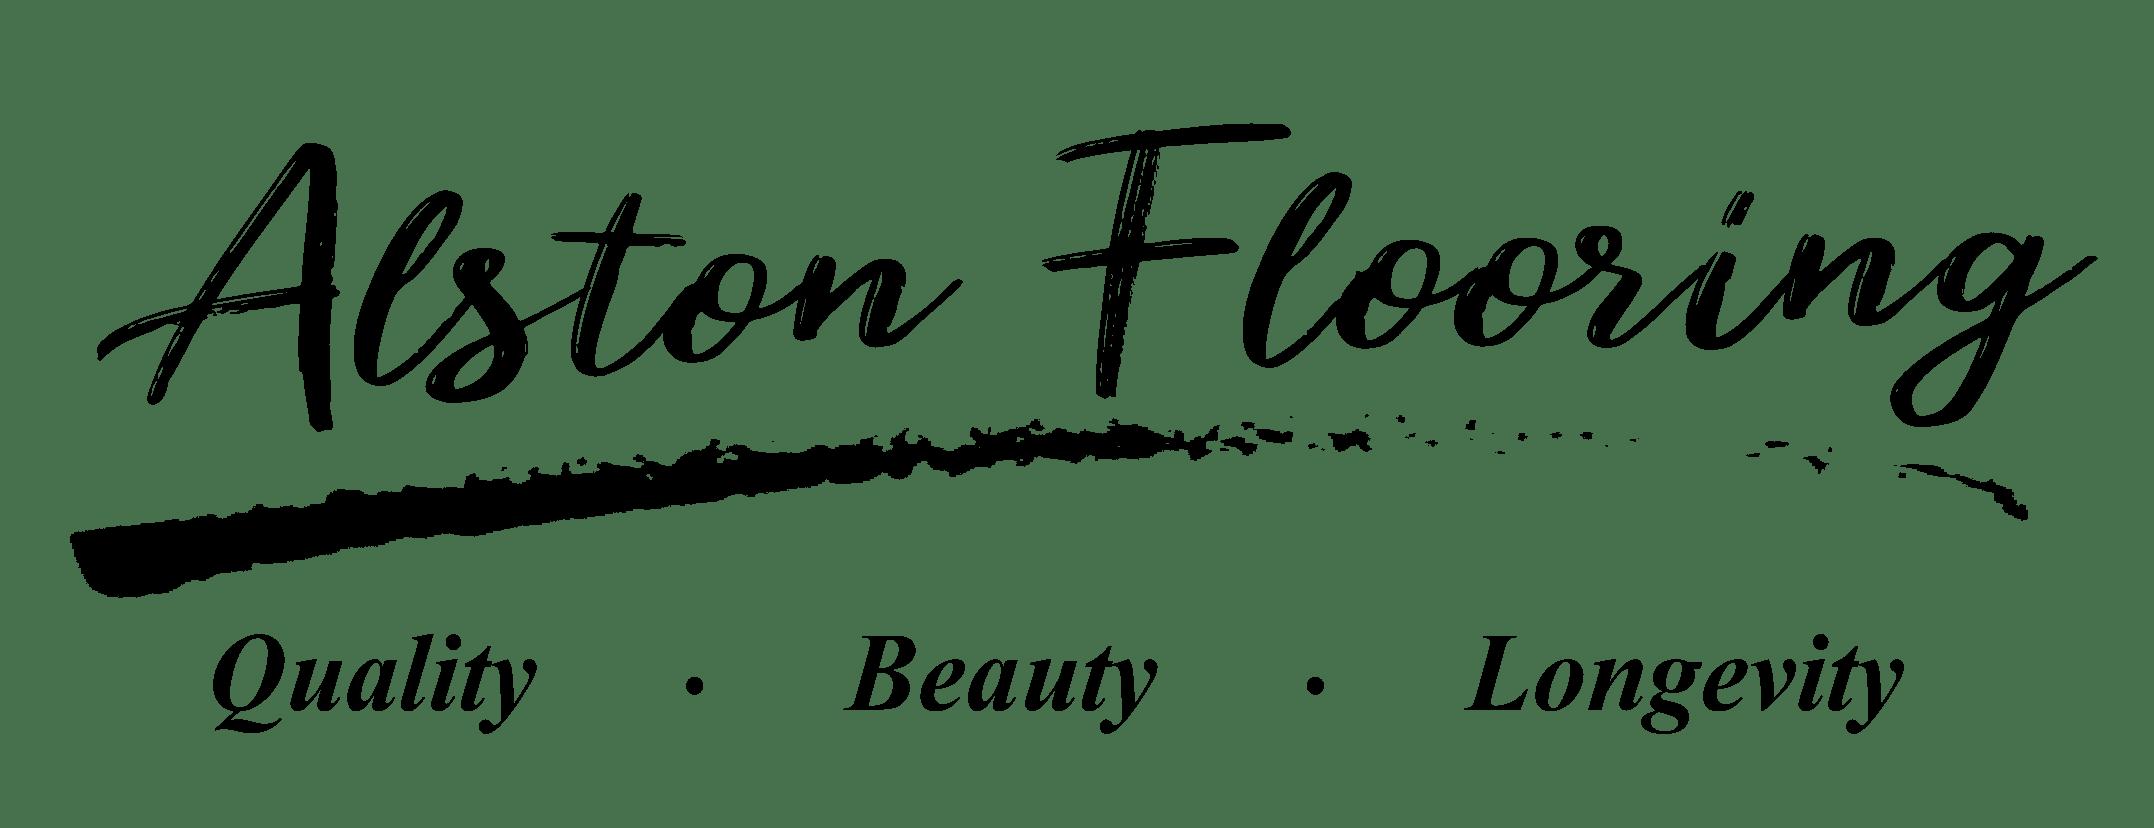 Alston in Murrieta, CA from Hardwood Floors Outlet